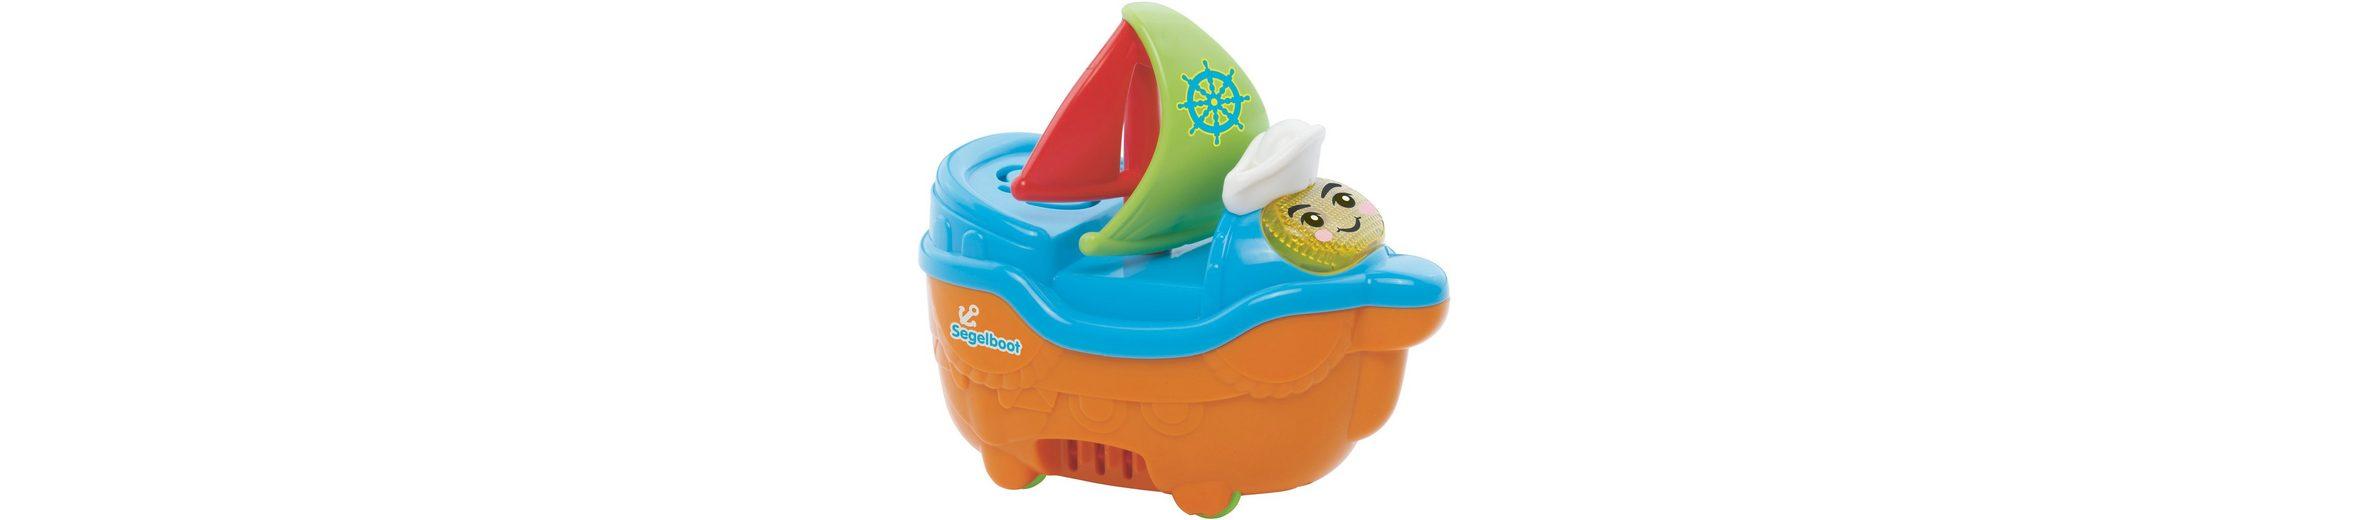 VTech Badespielzeug, »Tut Tut Baby Badewelt Segelboot«